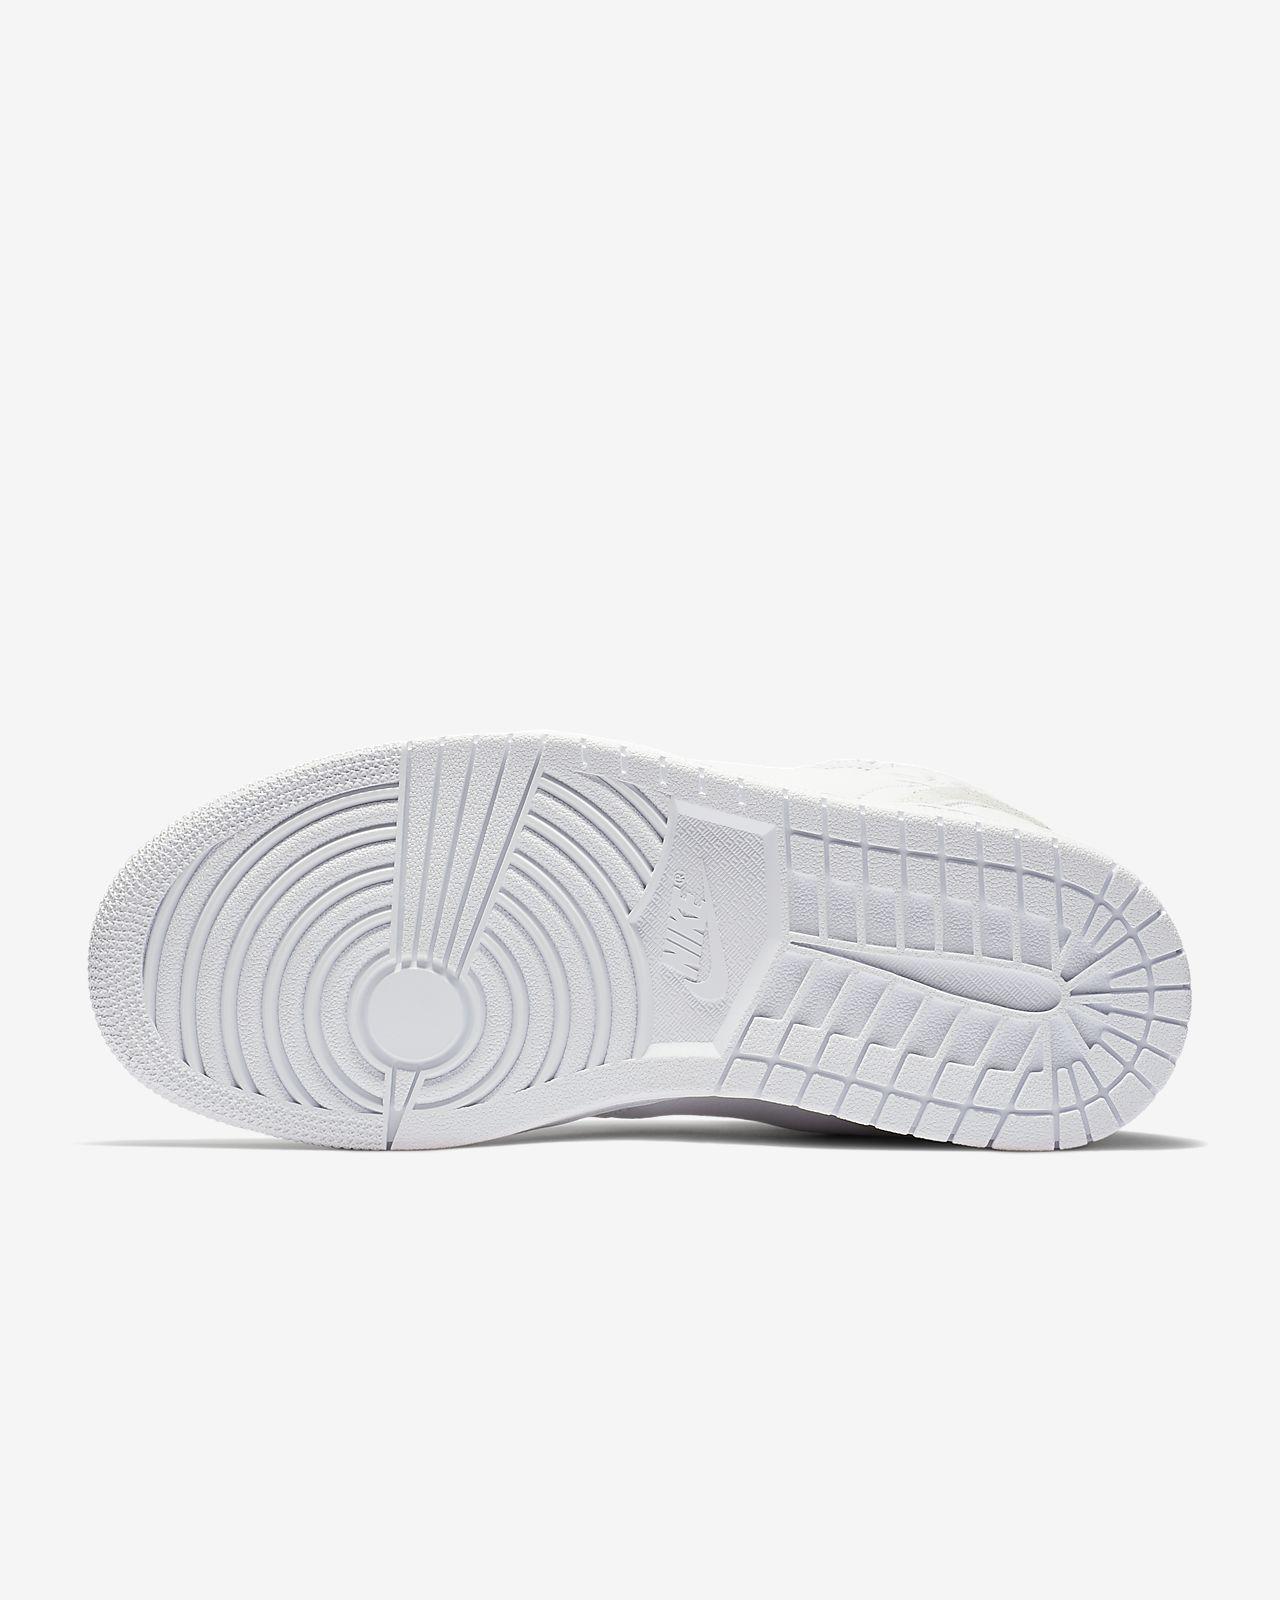 04206ca9 Air Jordan 1 High Zip Women's Shoe. Nike.com